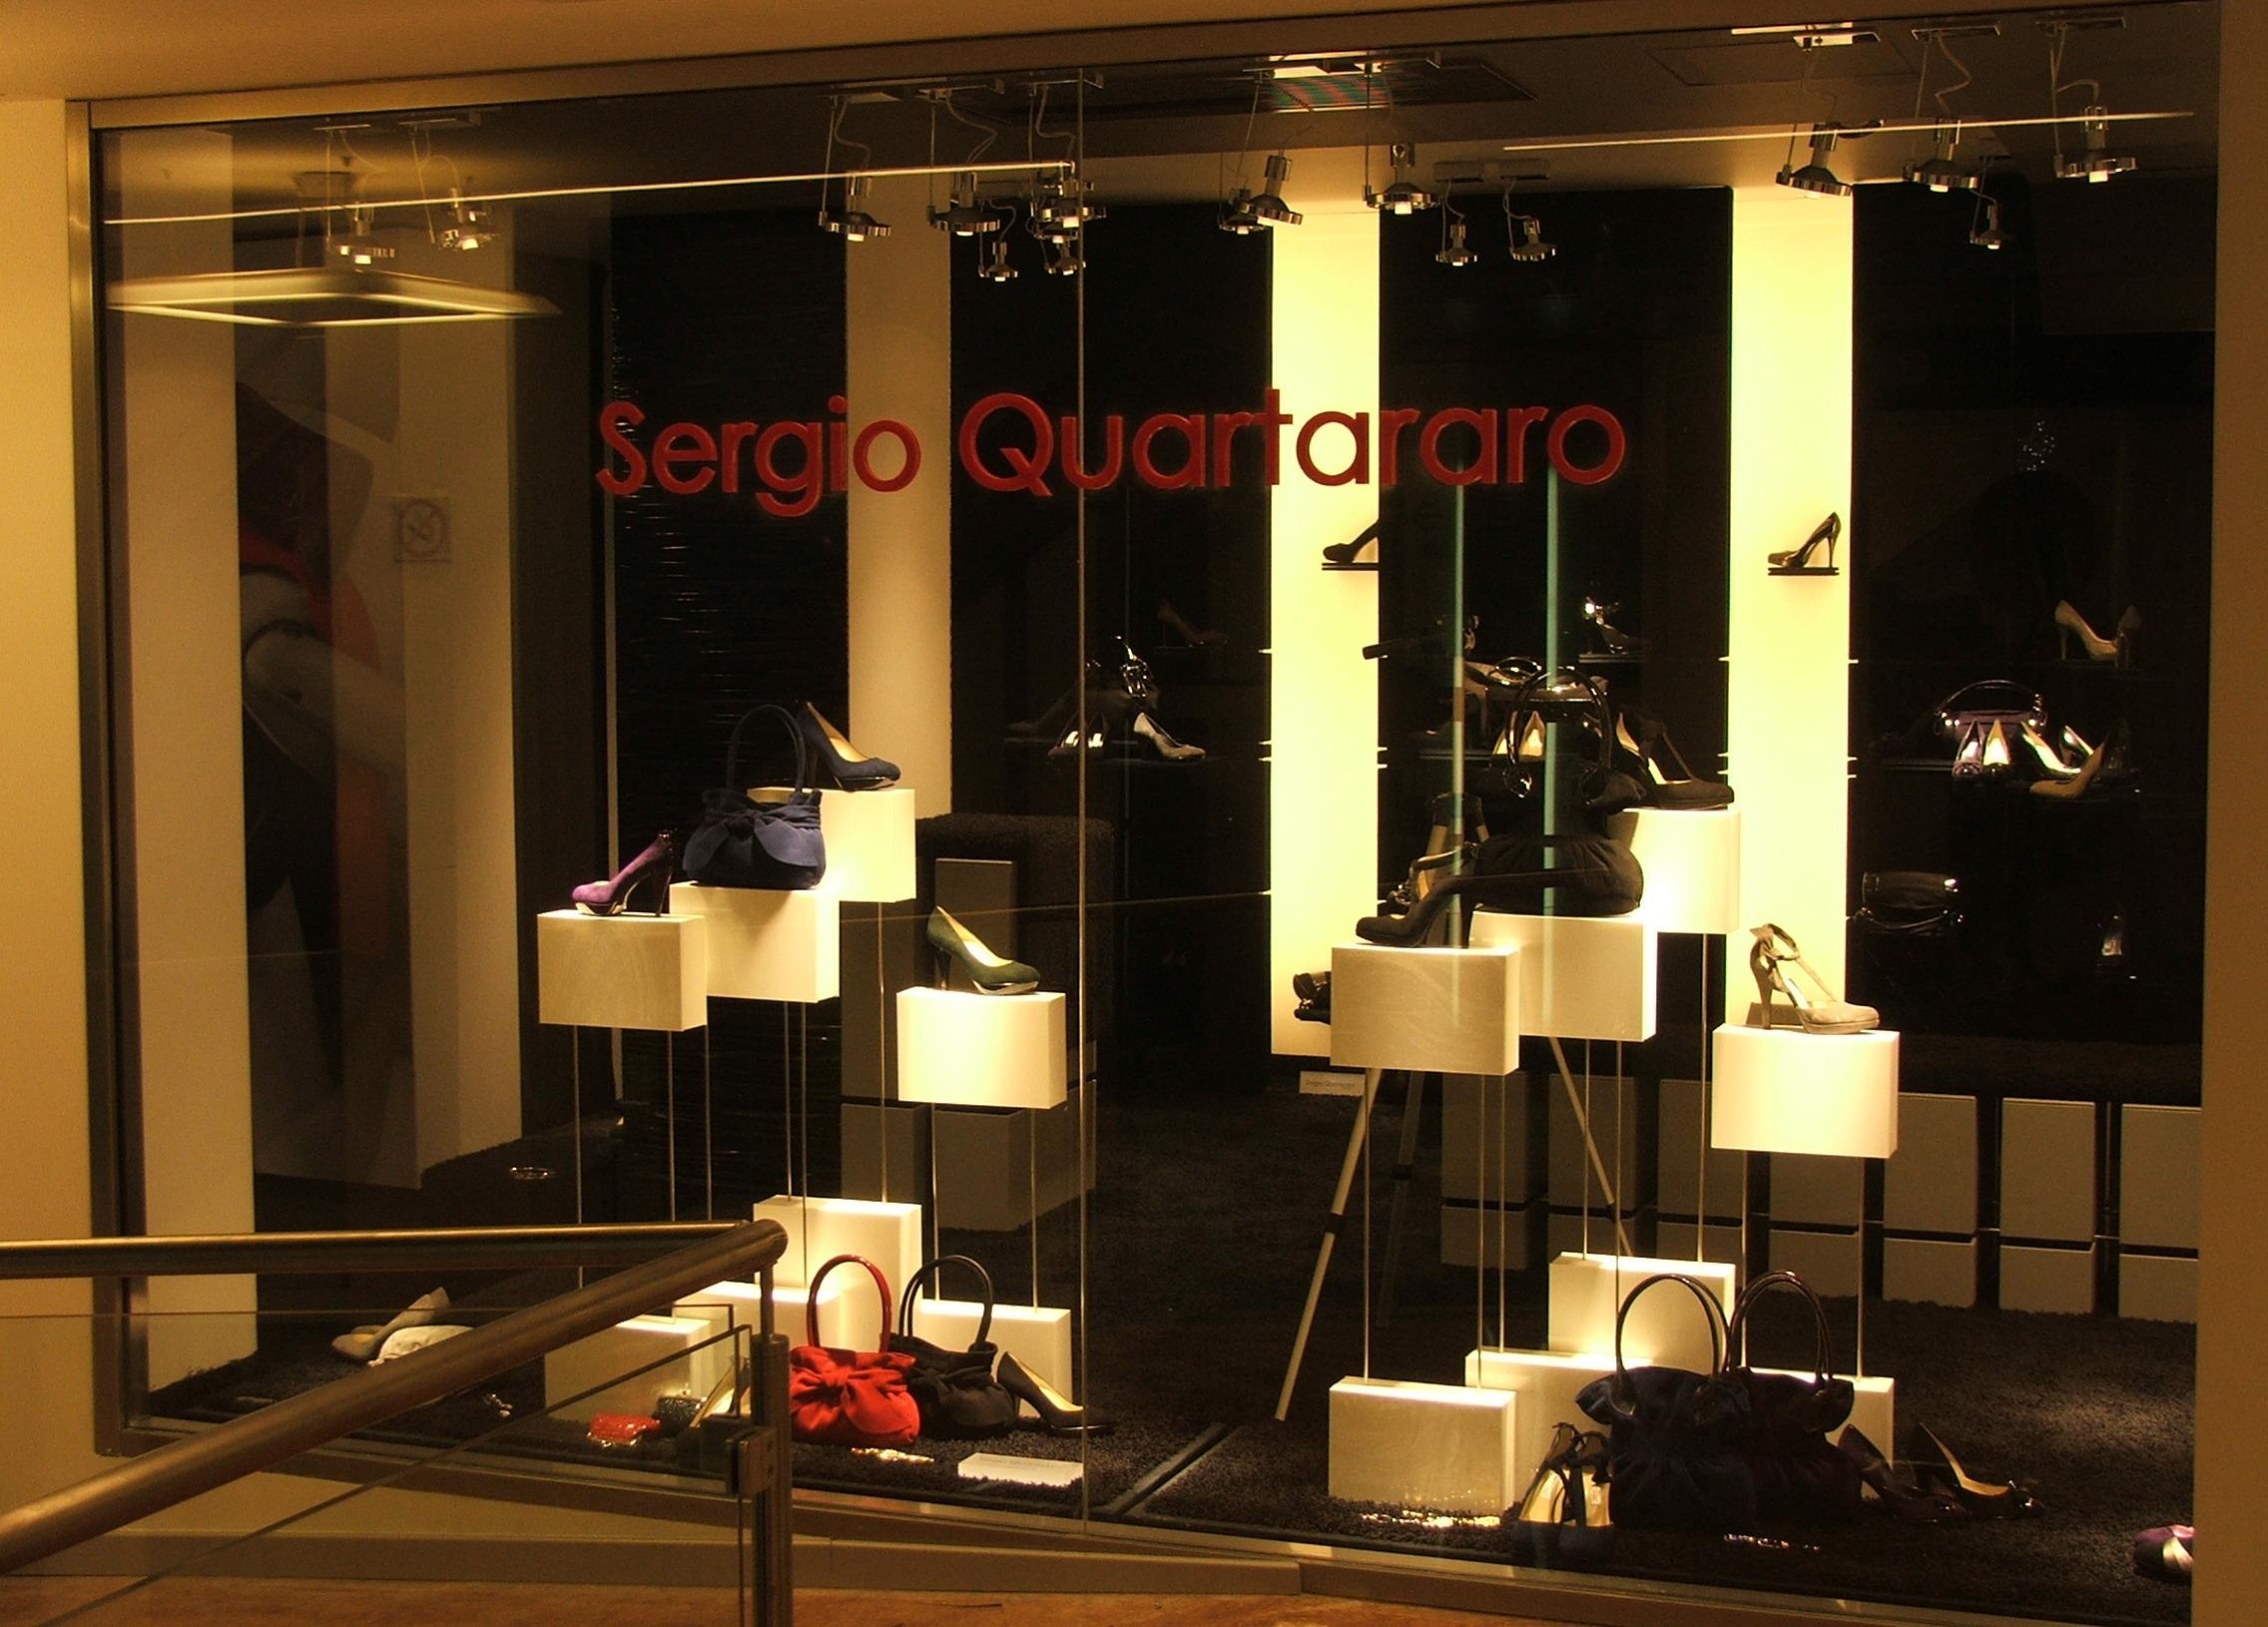 SERGIO QUARTARARO palermo 2009